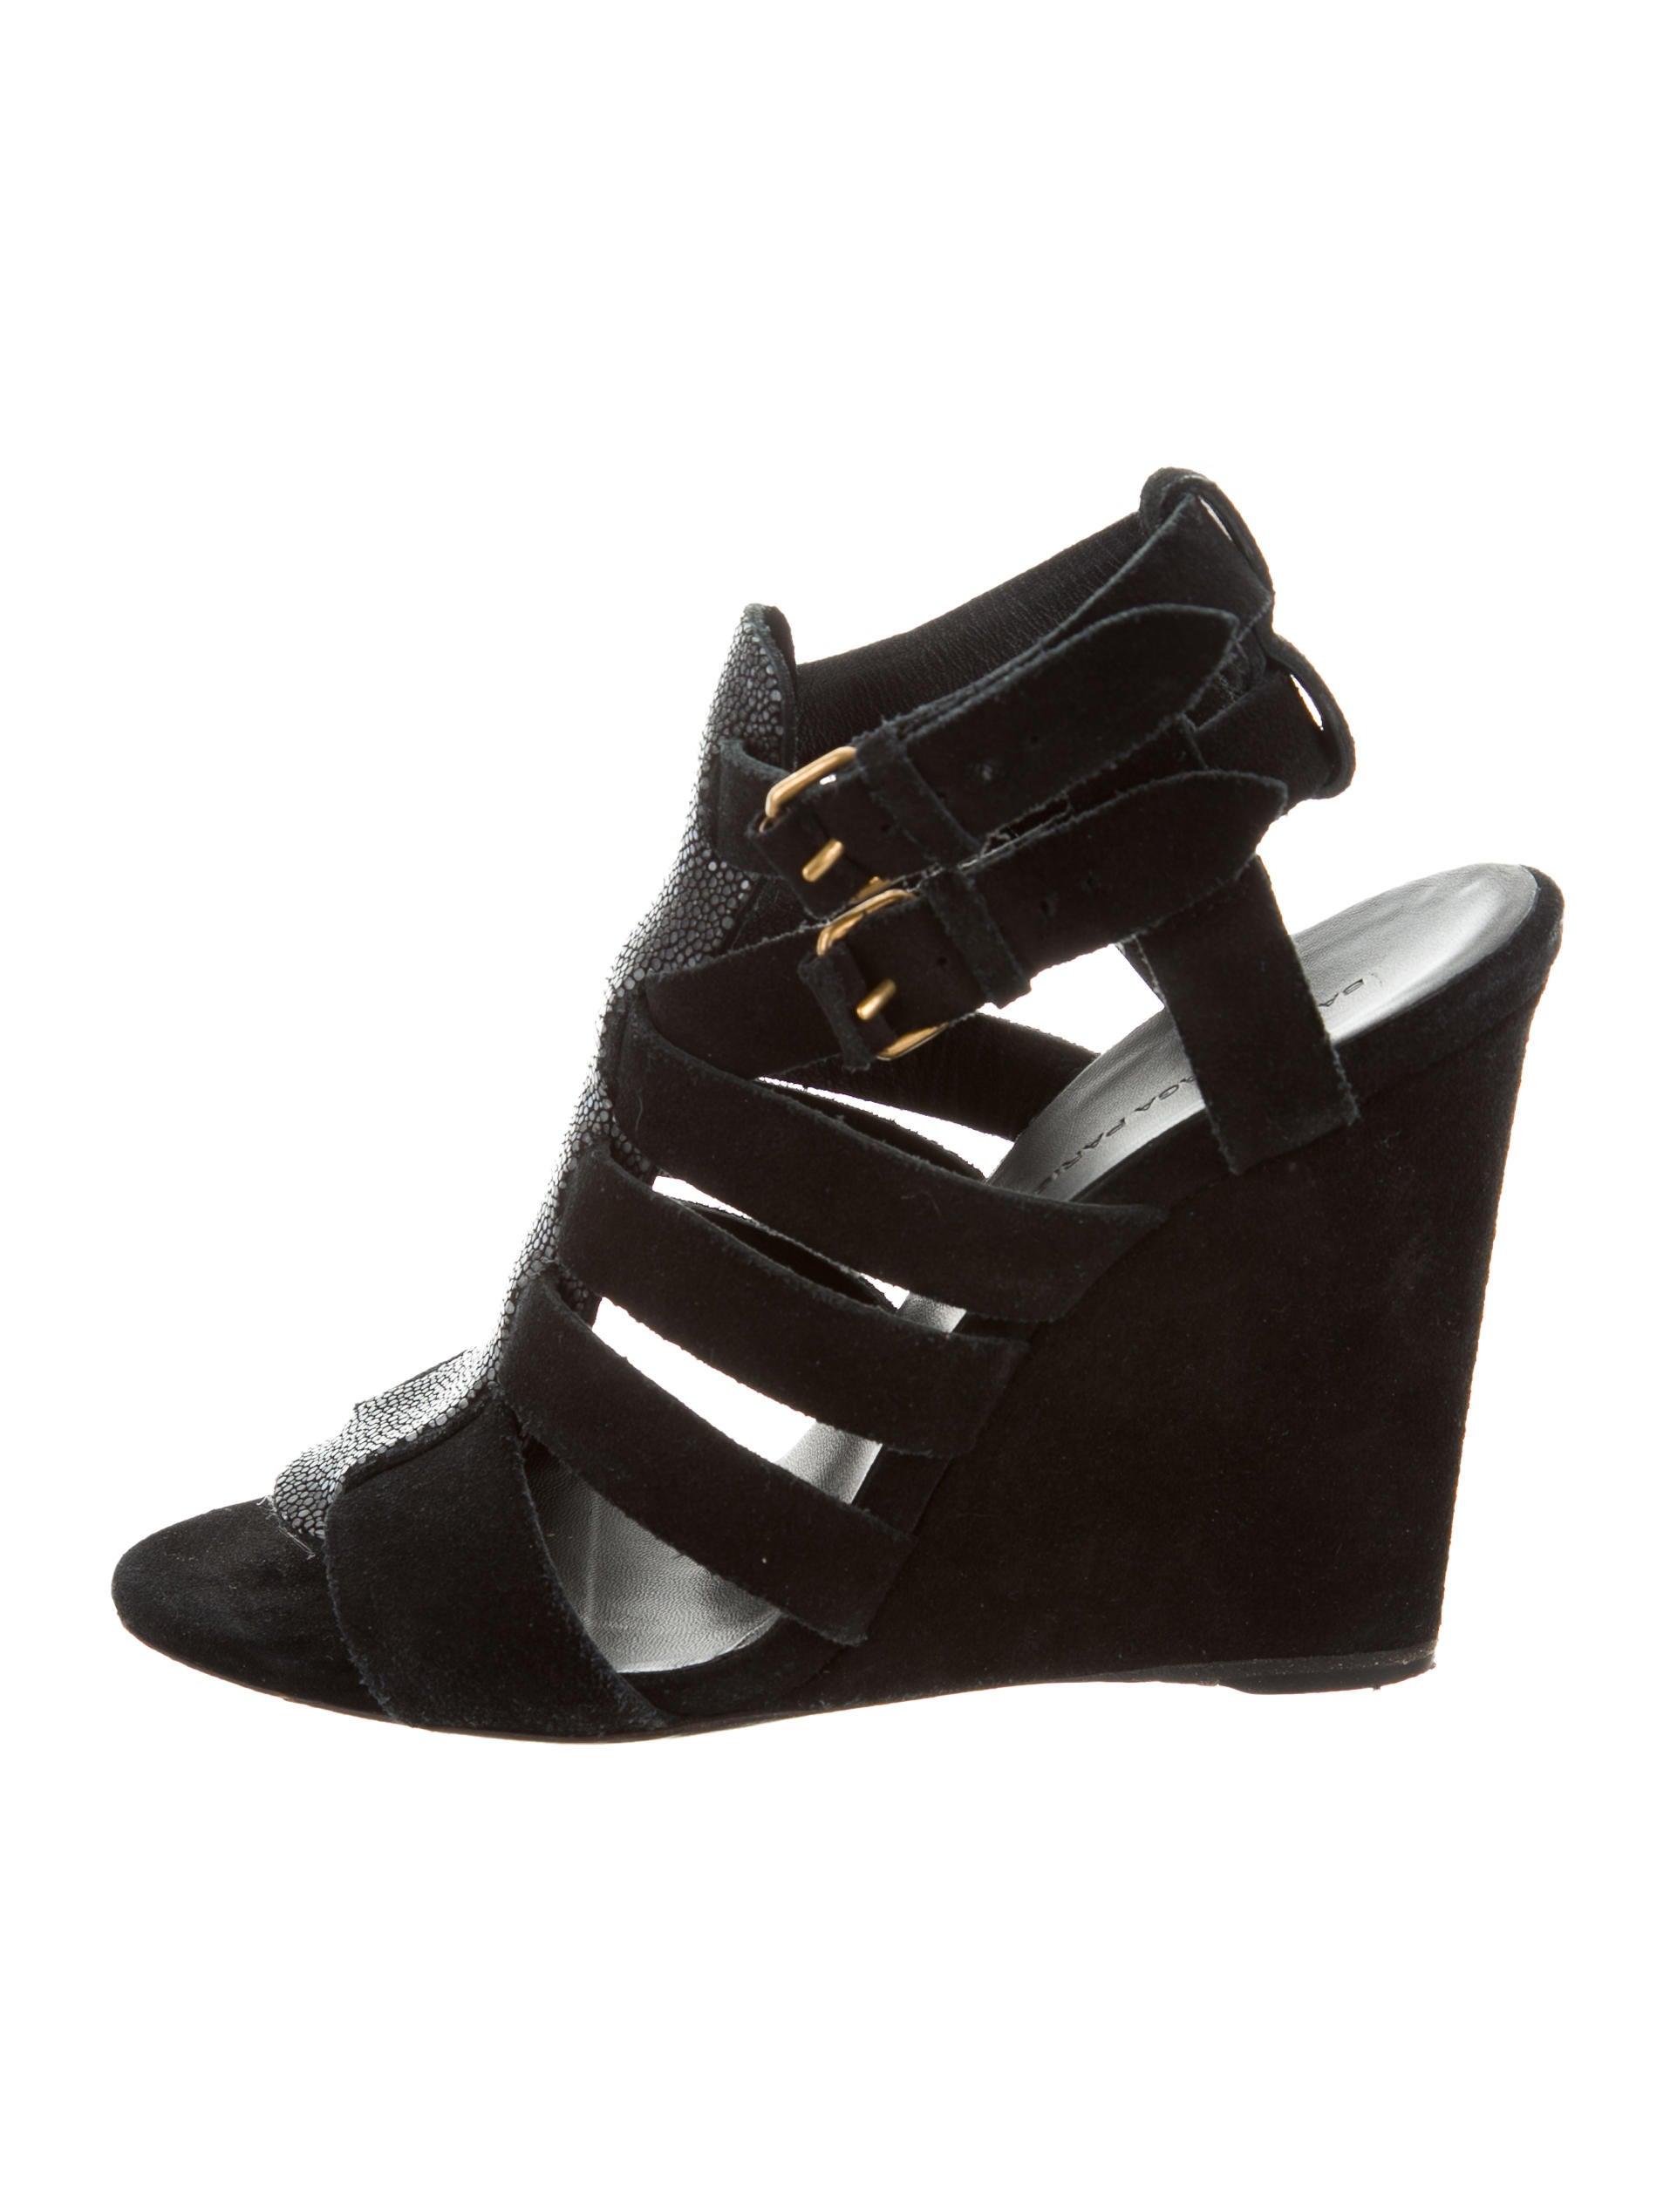 cheap sale new styles Balenciaga Stingray Wedge Sandals Inexpensive cheap top quality where to buy buy cheap ebay TxGSDv